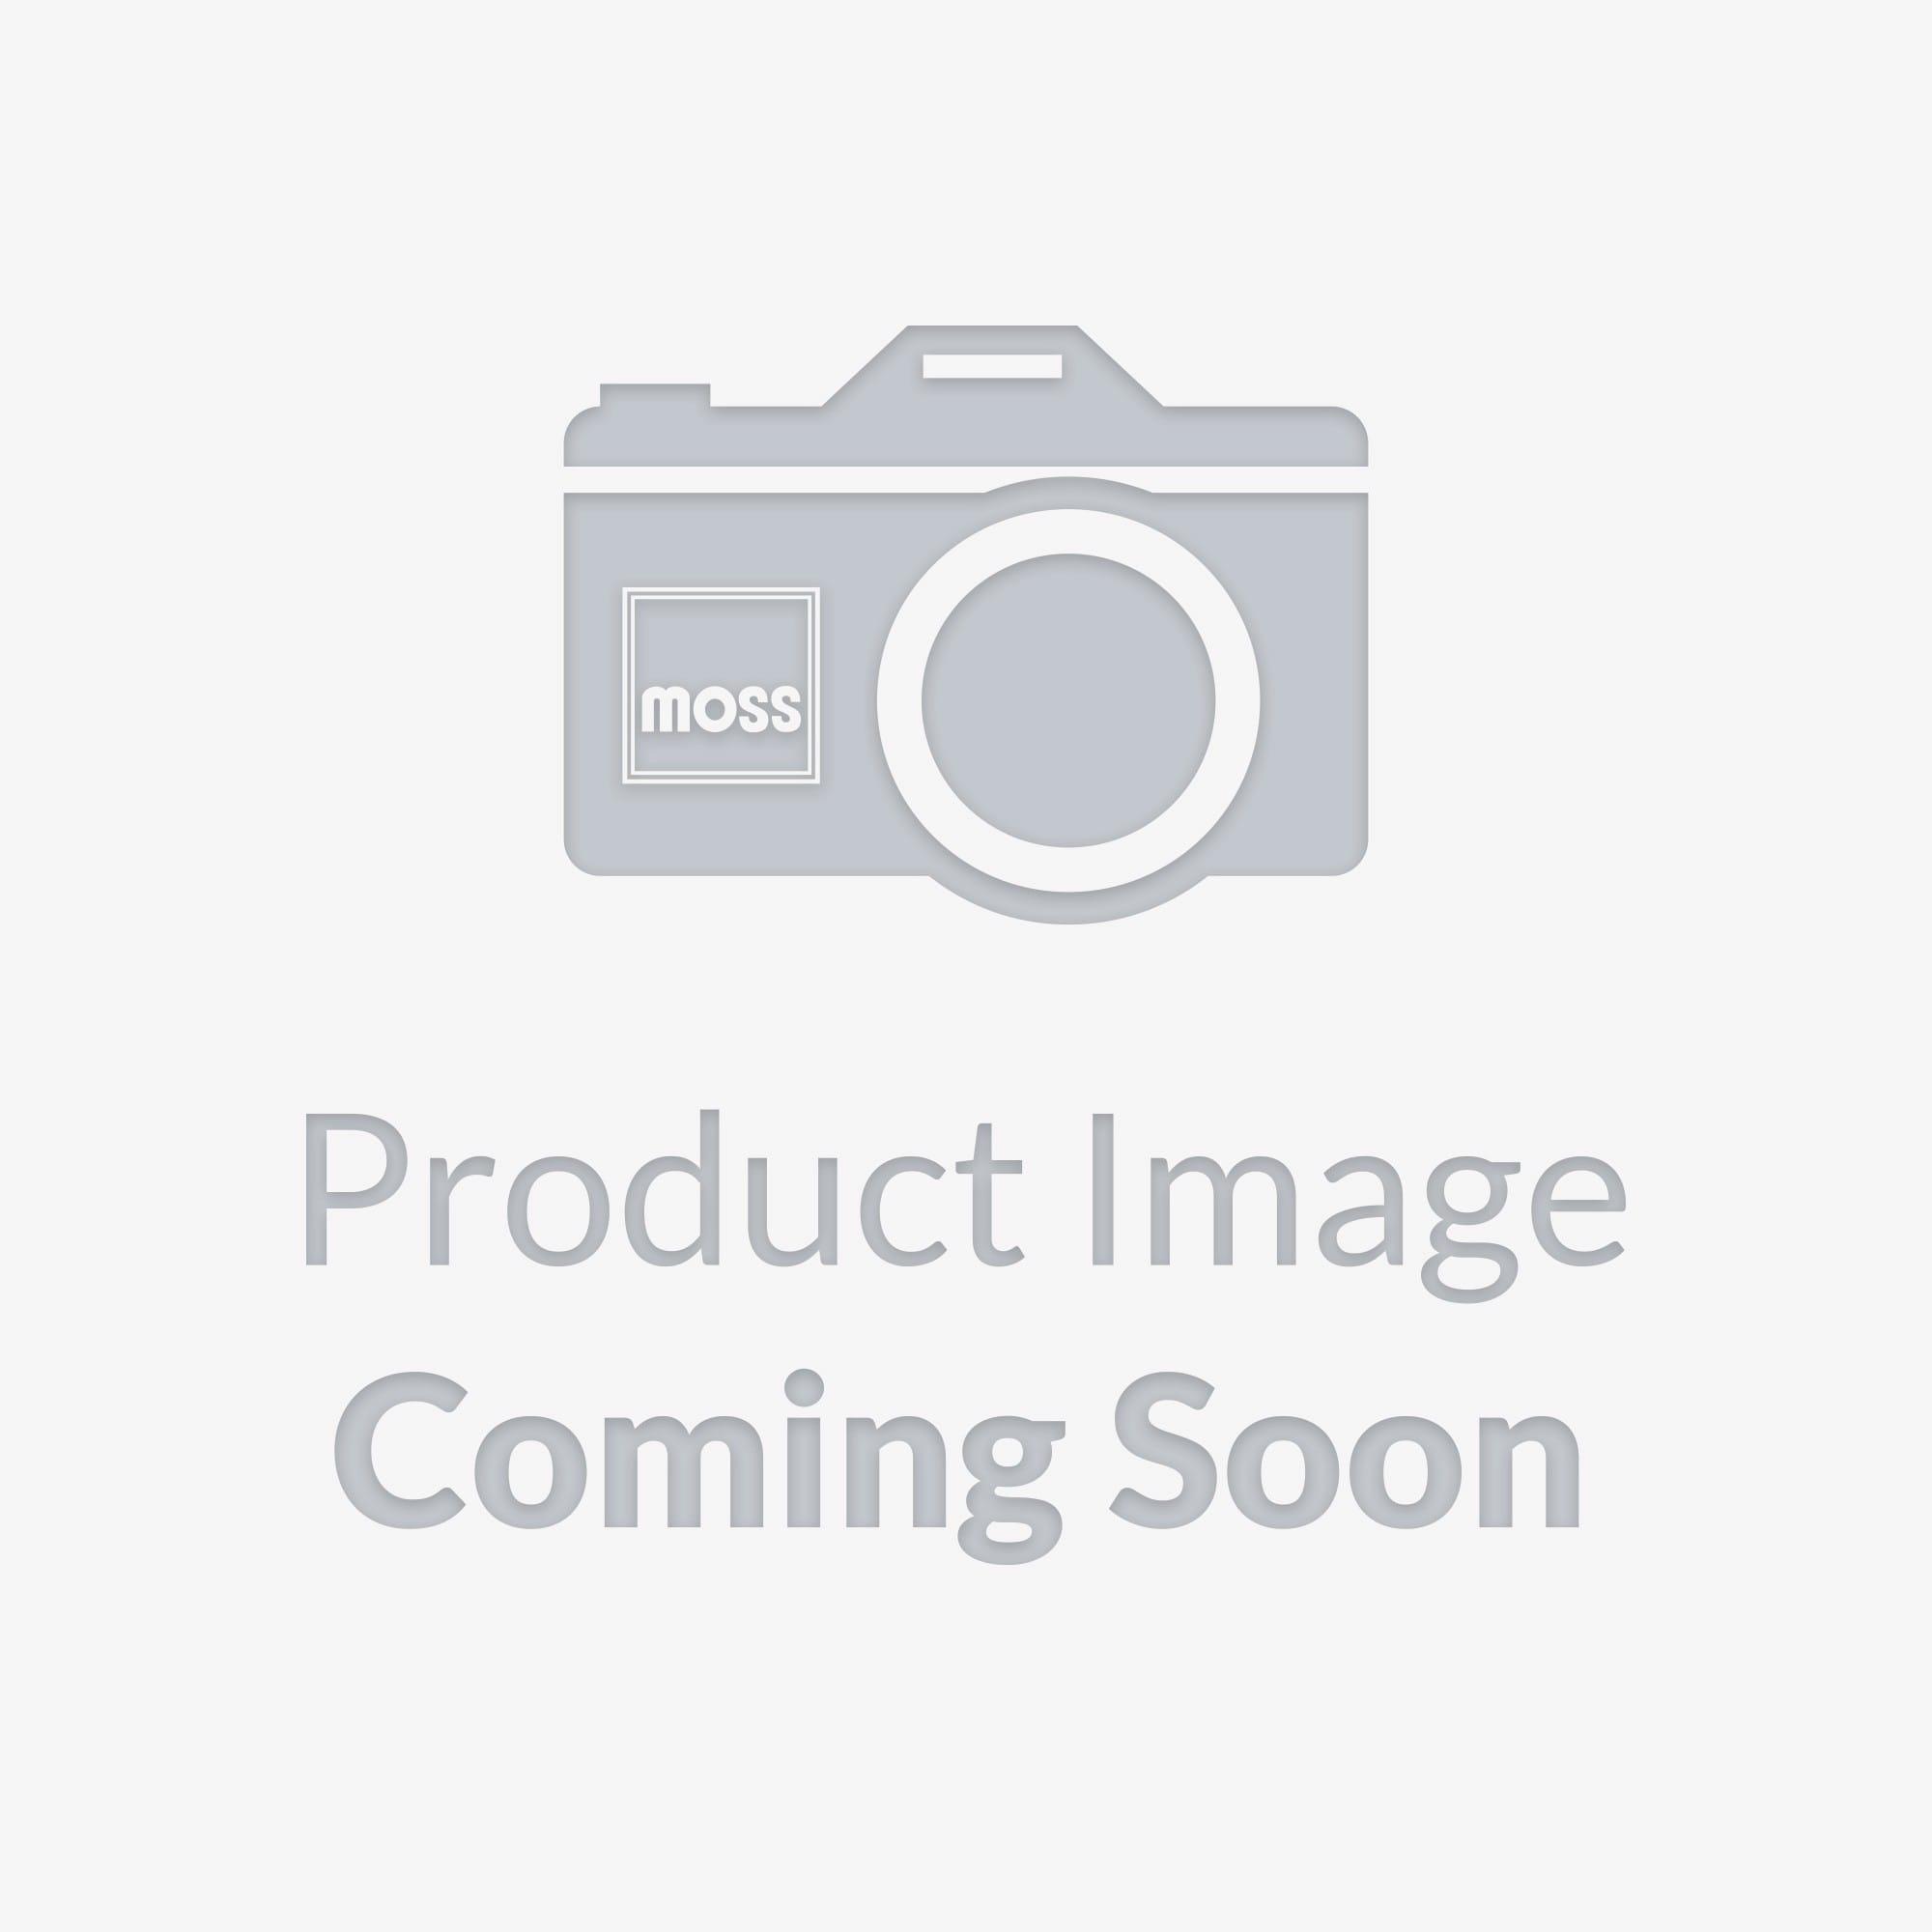 Headlight Dimmer Switch Wiring Diagram Http Wwwcumminsforumcom